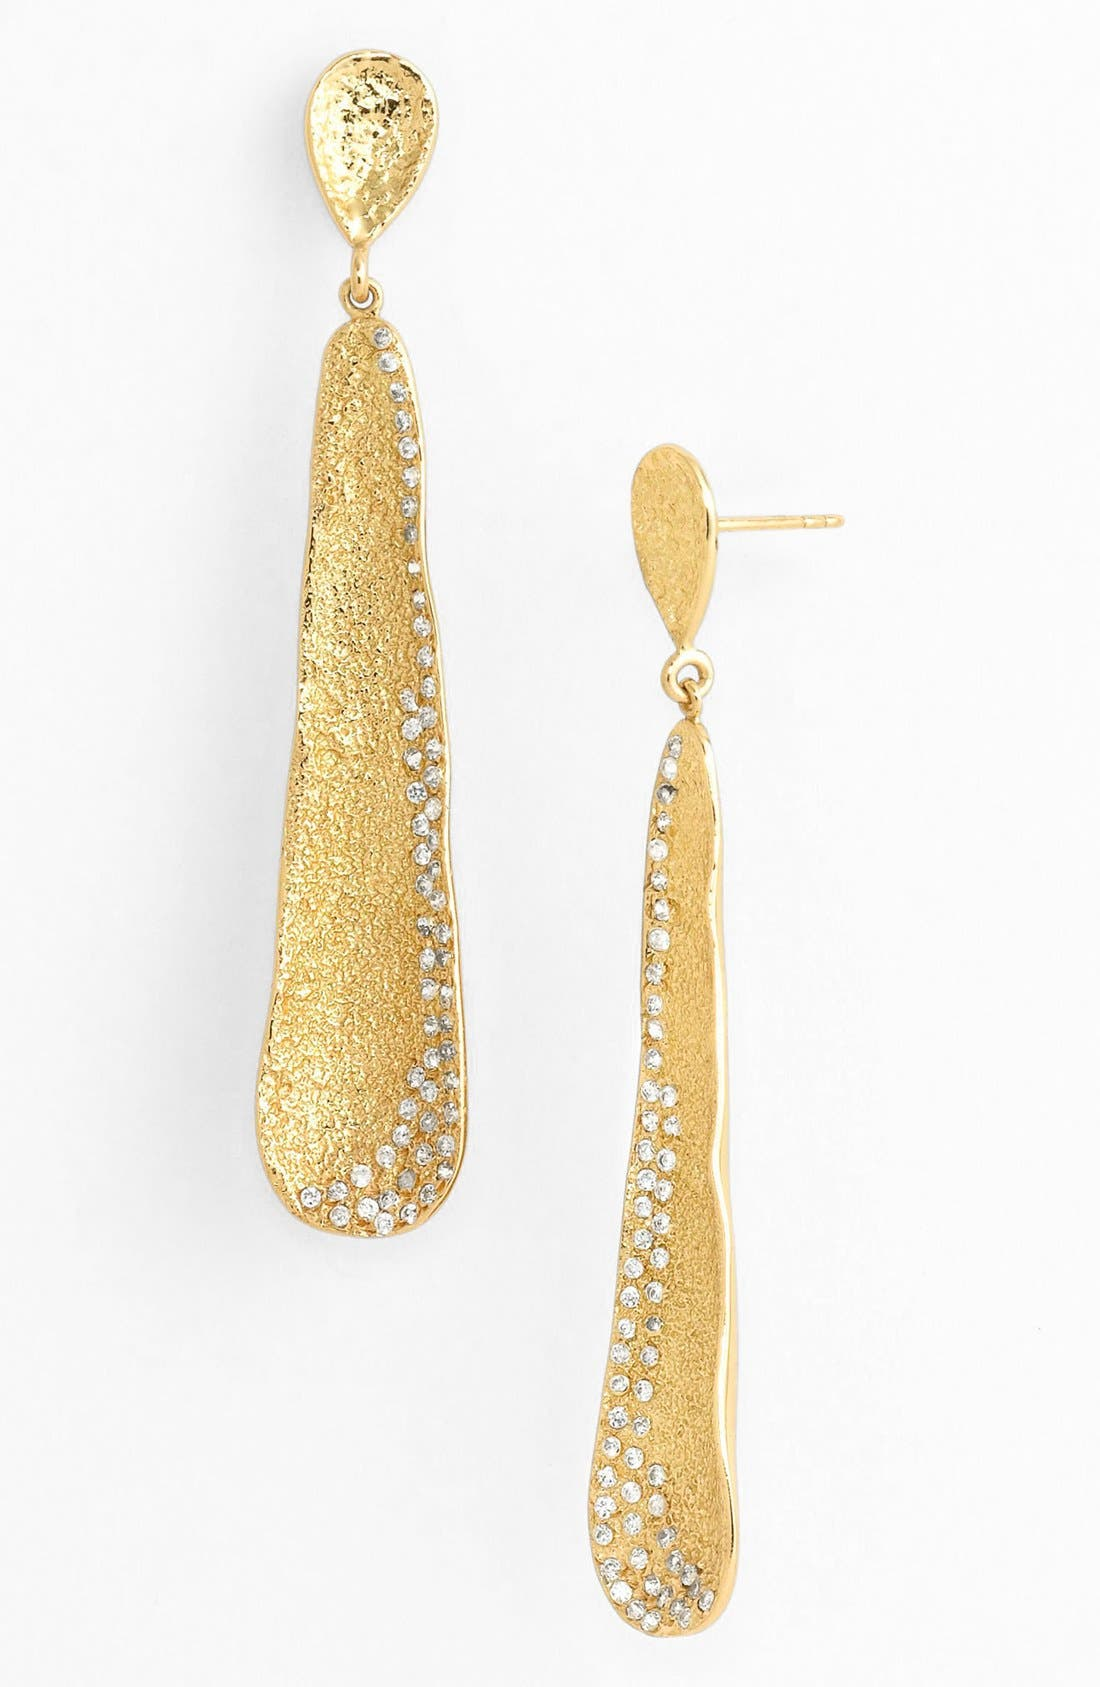 Alternate Image 1 Selected - Melinda Maria 'Hepburn' Pod Earrings